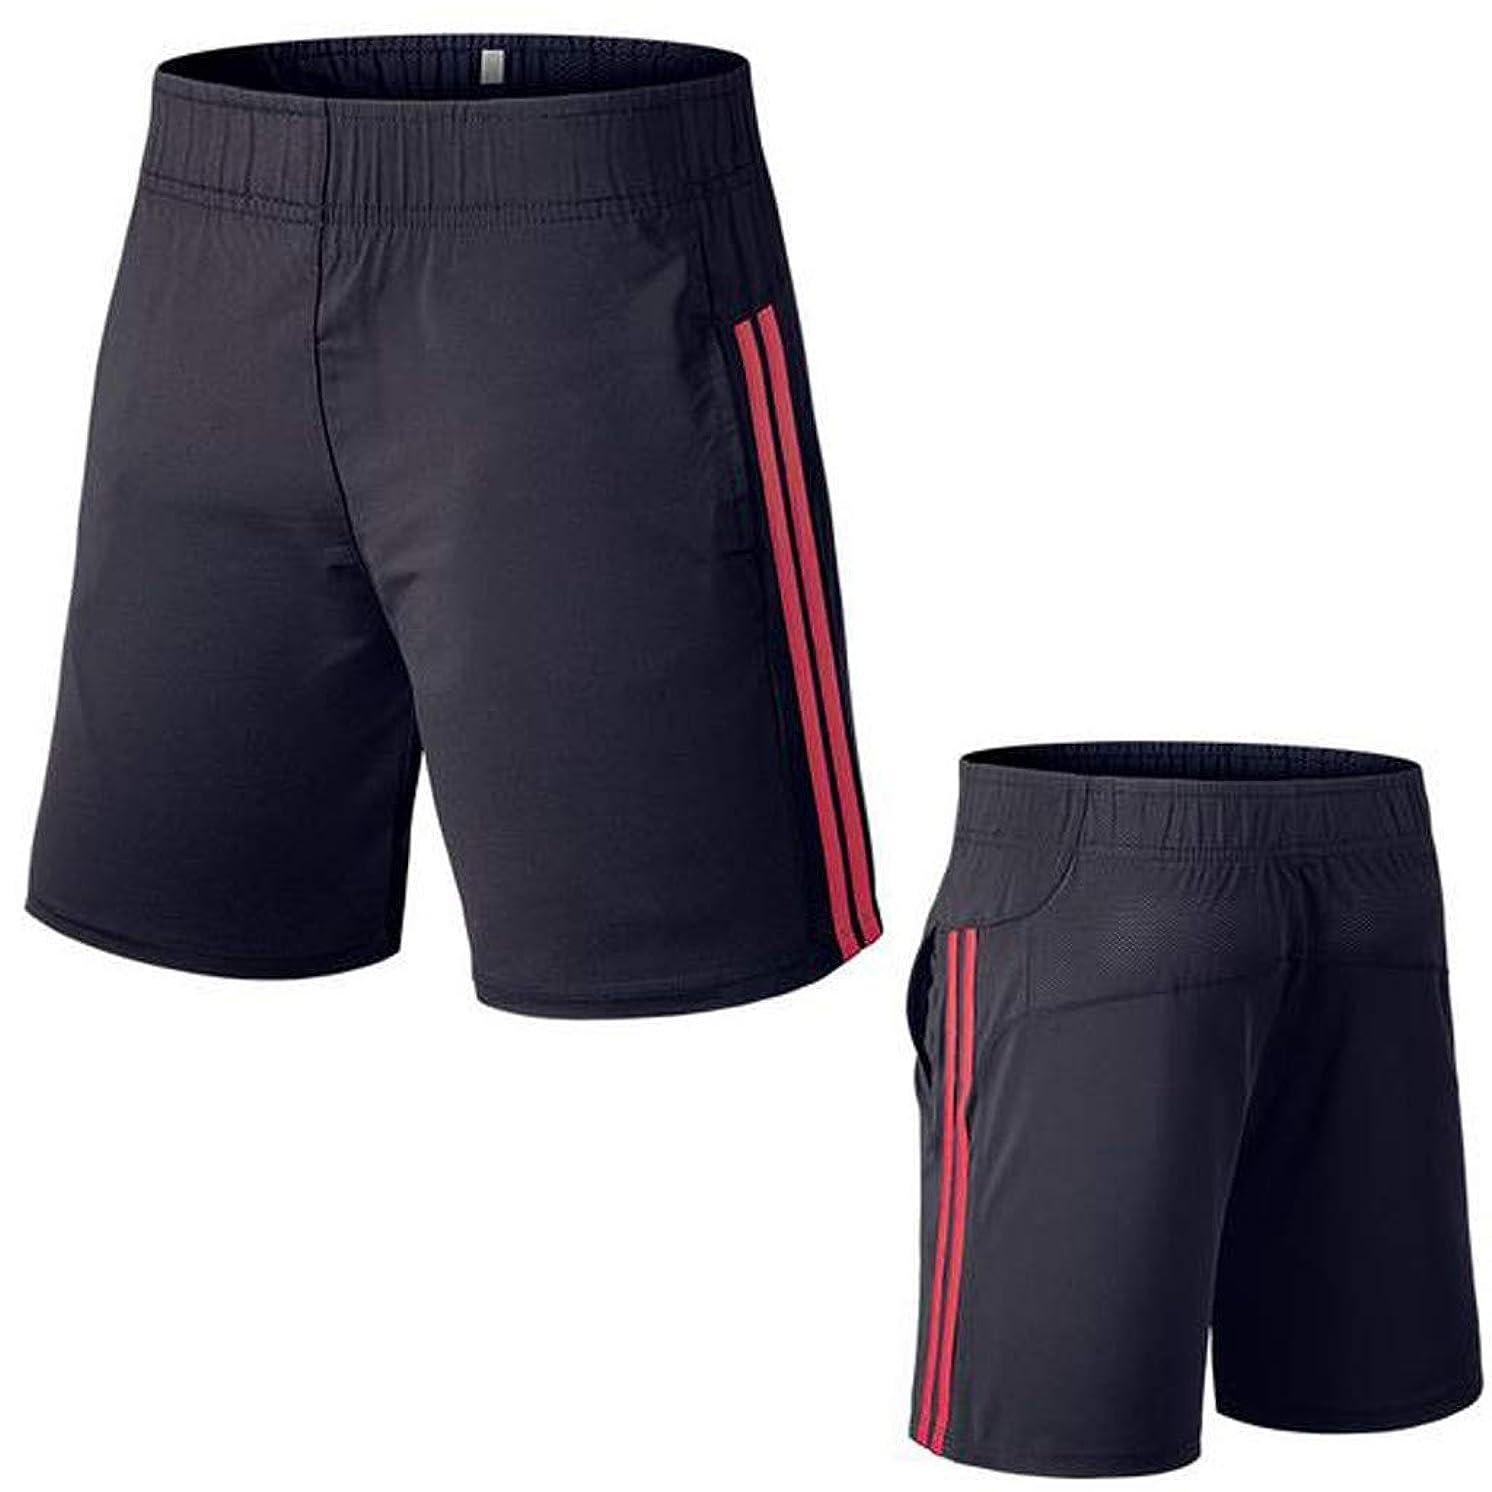 iYBUIA Mens Fitness Stripe Bodybuilding with Pocket Skin Tight-Drying Short Sports Leggings Pants